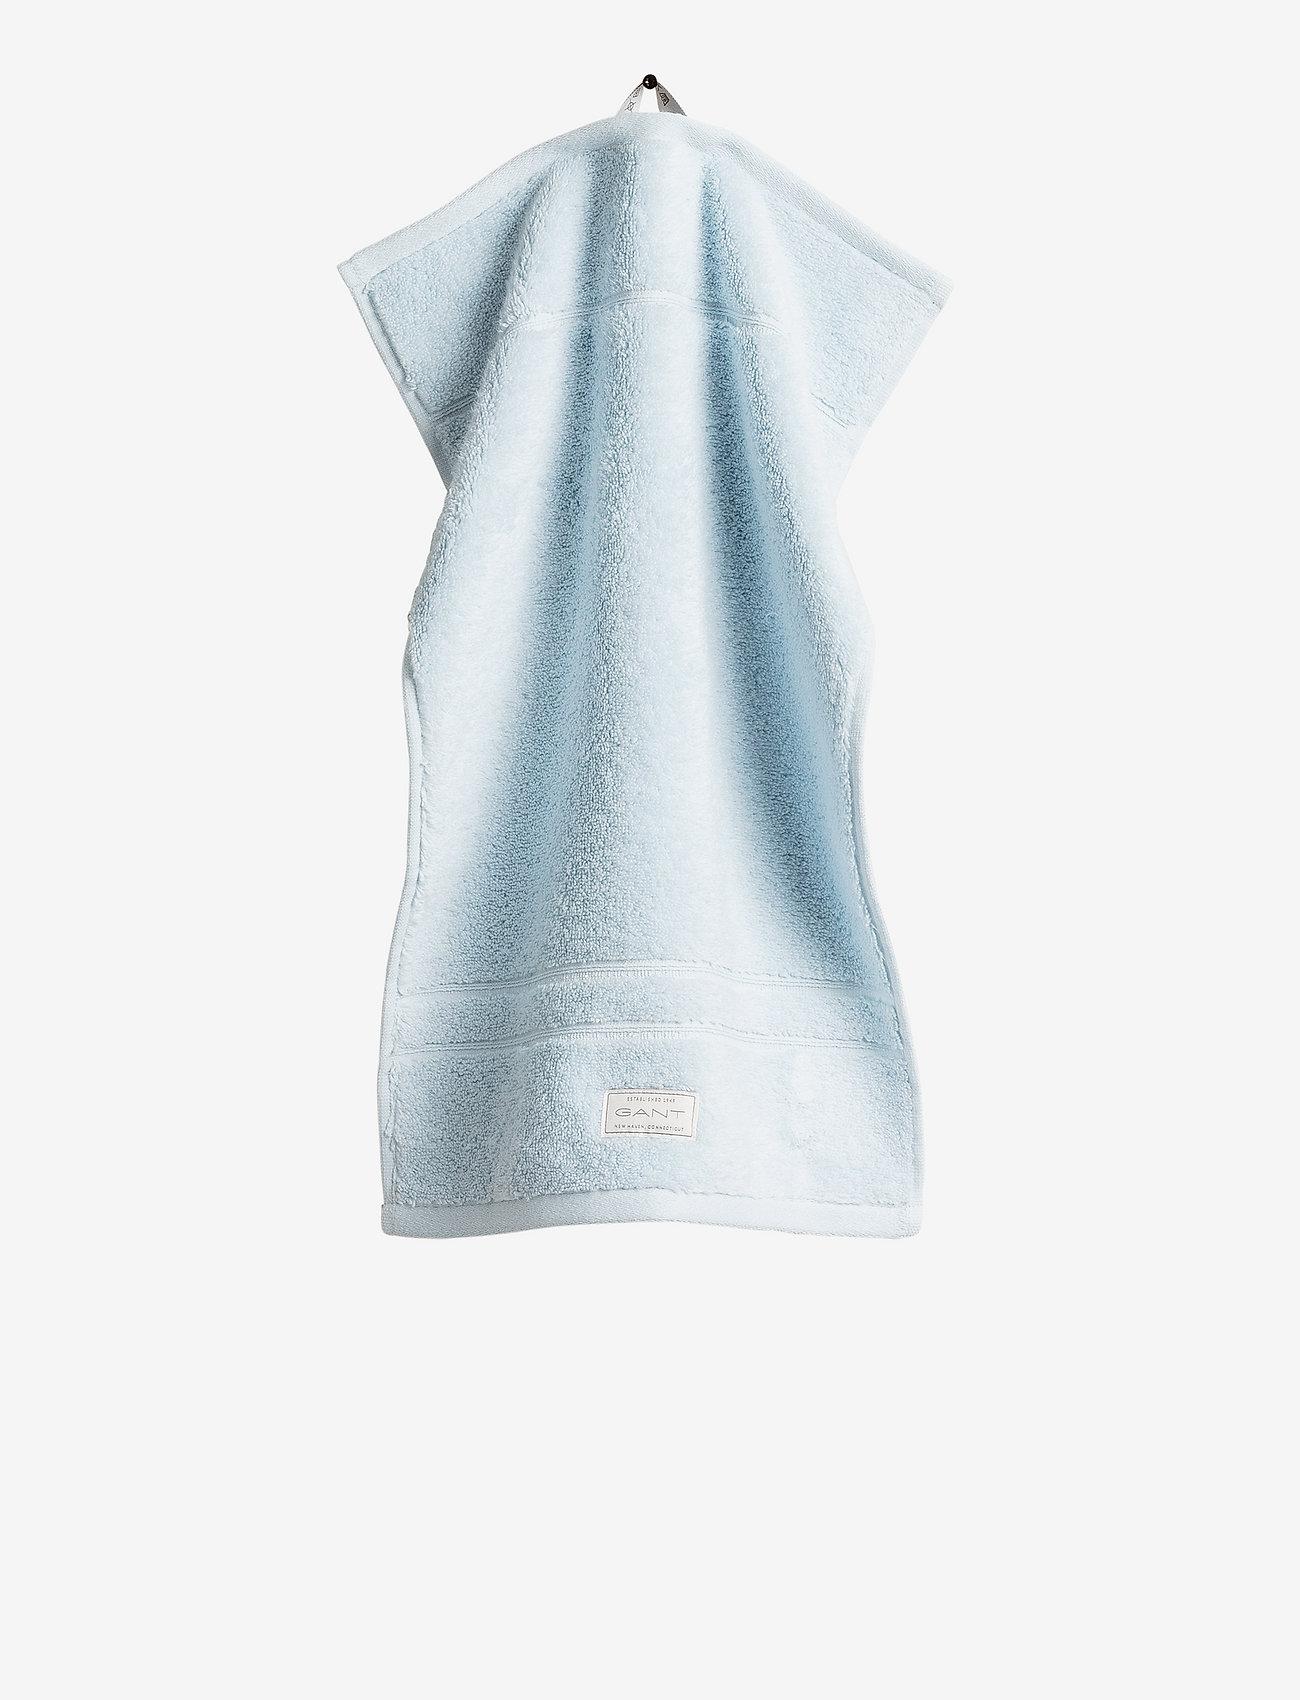 GANT - PREMIUM TOWEL 30X50 - hand towels & bath towels - pacific blue - 0